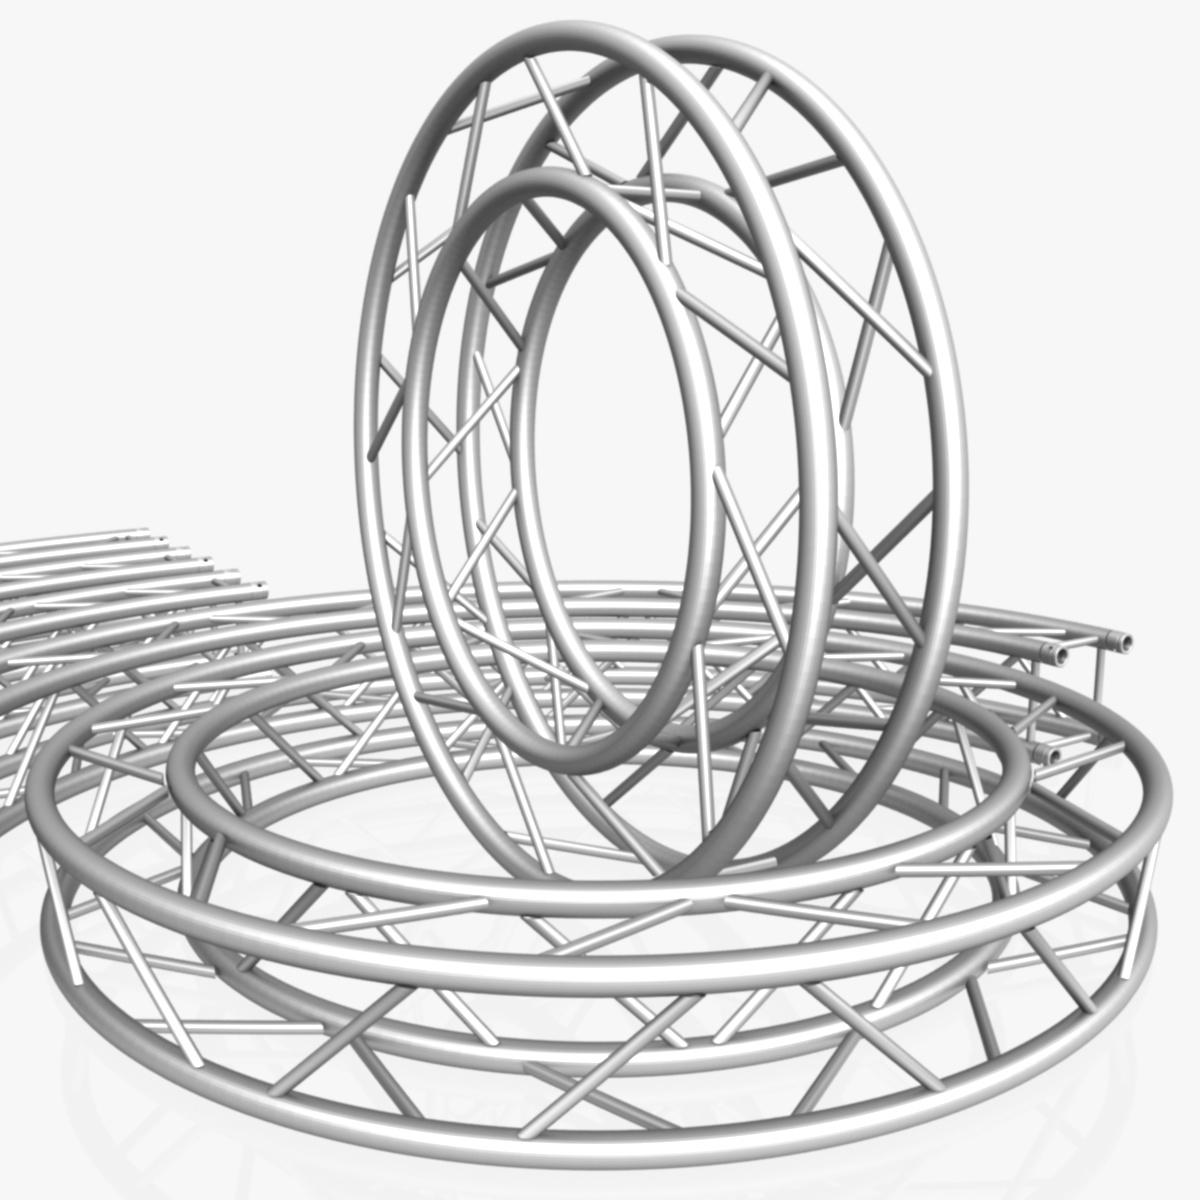 circle square truss modular collection 3d model 3ds max dxf fbx c4d dae  texture obj 252336